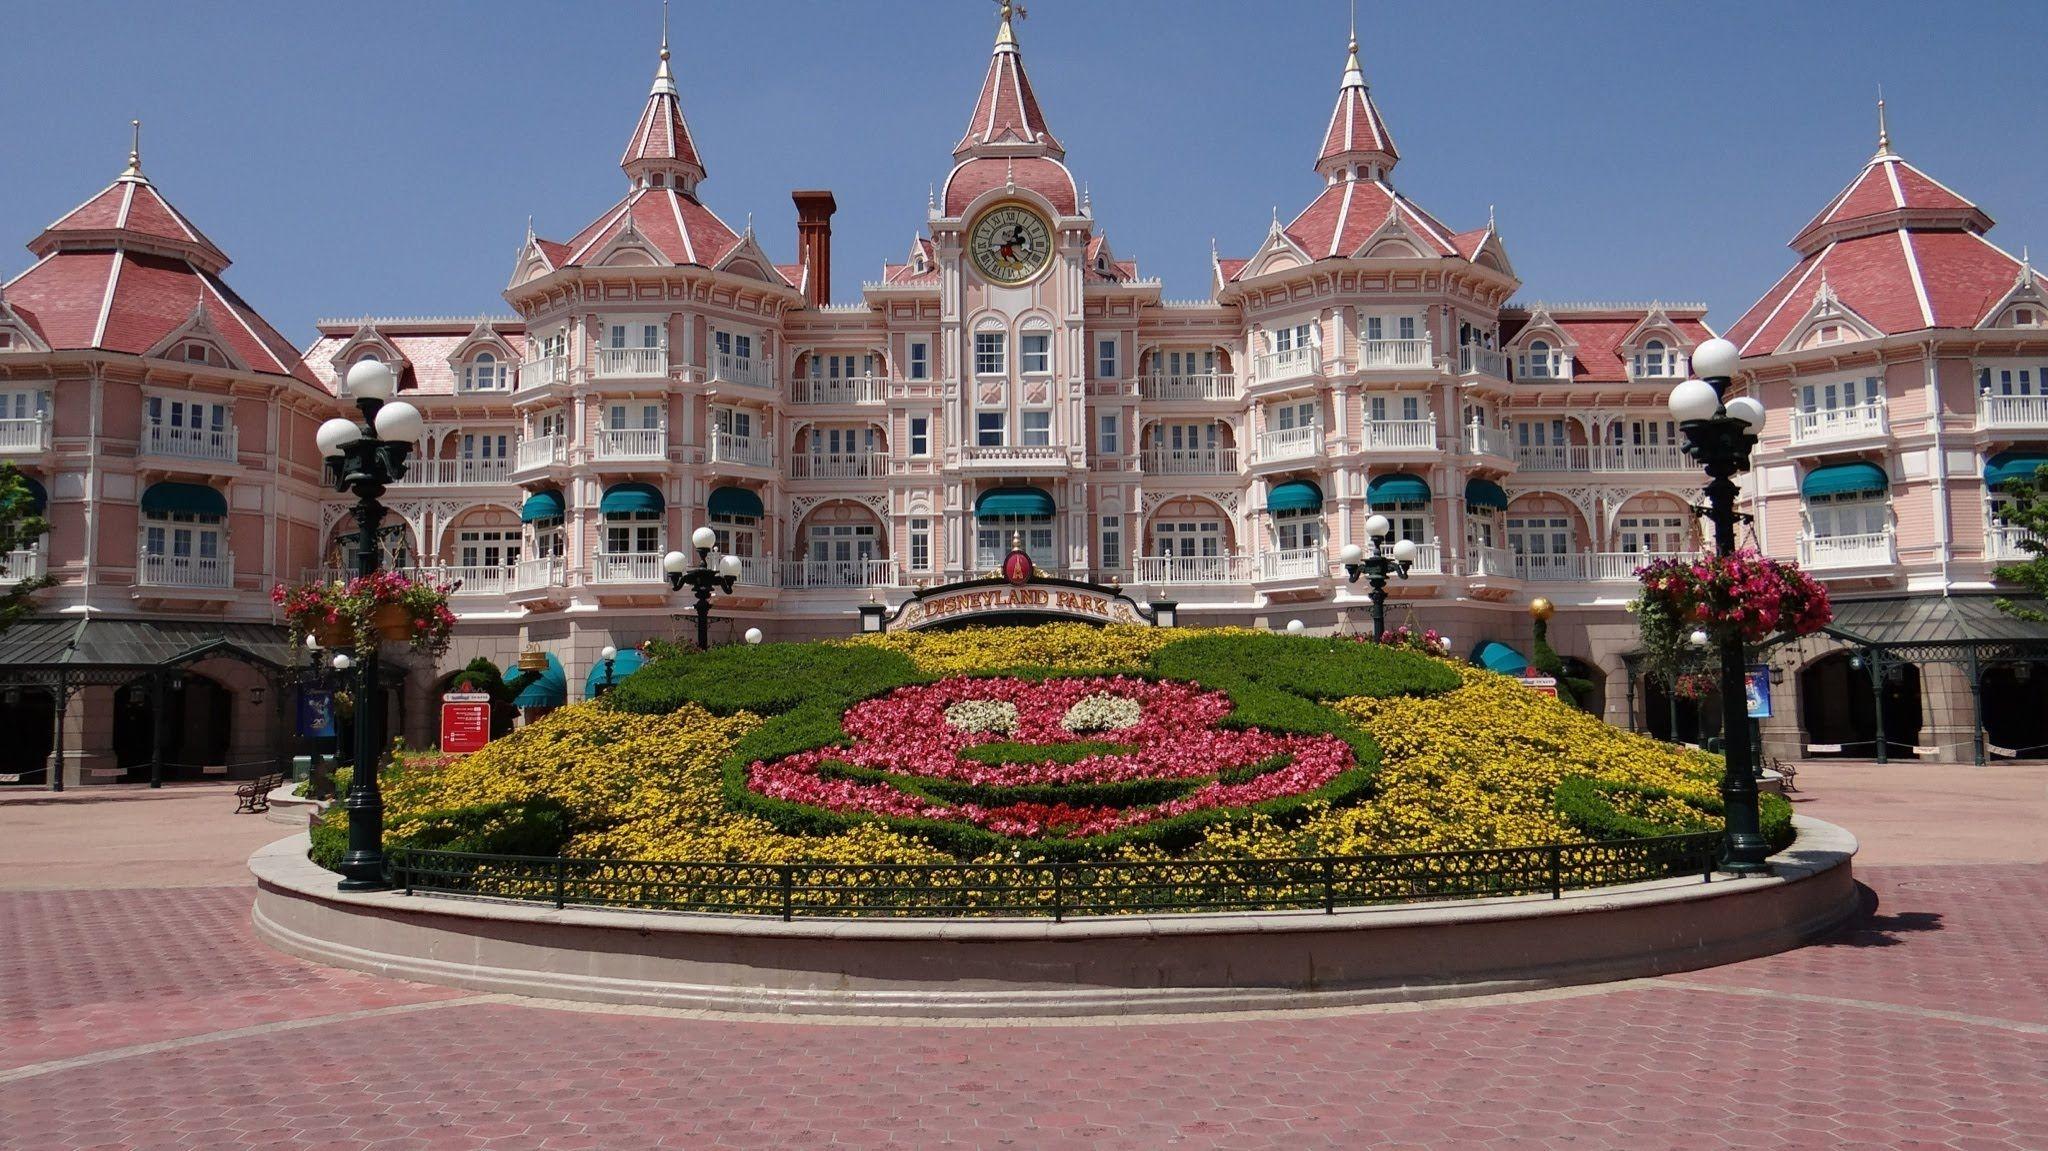 Disneyland Paris Disneyland Hotel Tour | Disneyland Parijs | Pinterest | Disneyland hotel ...